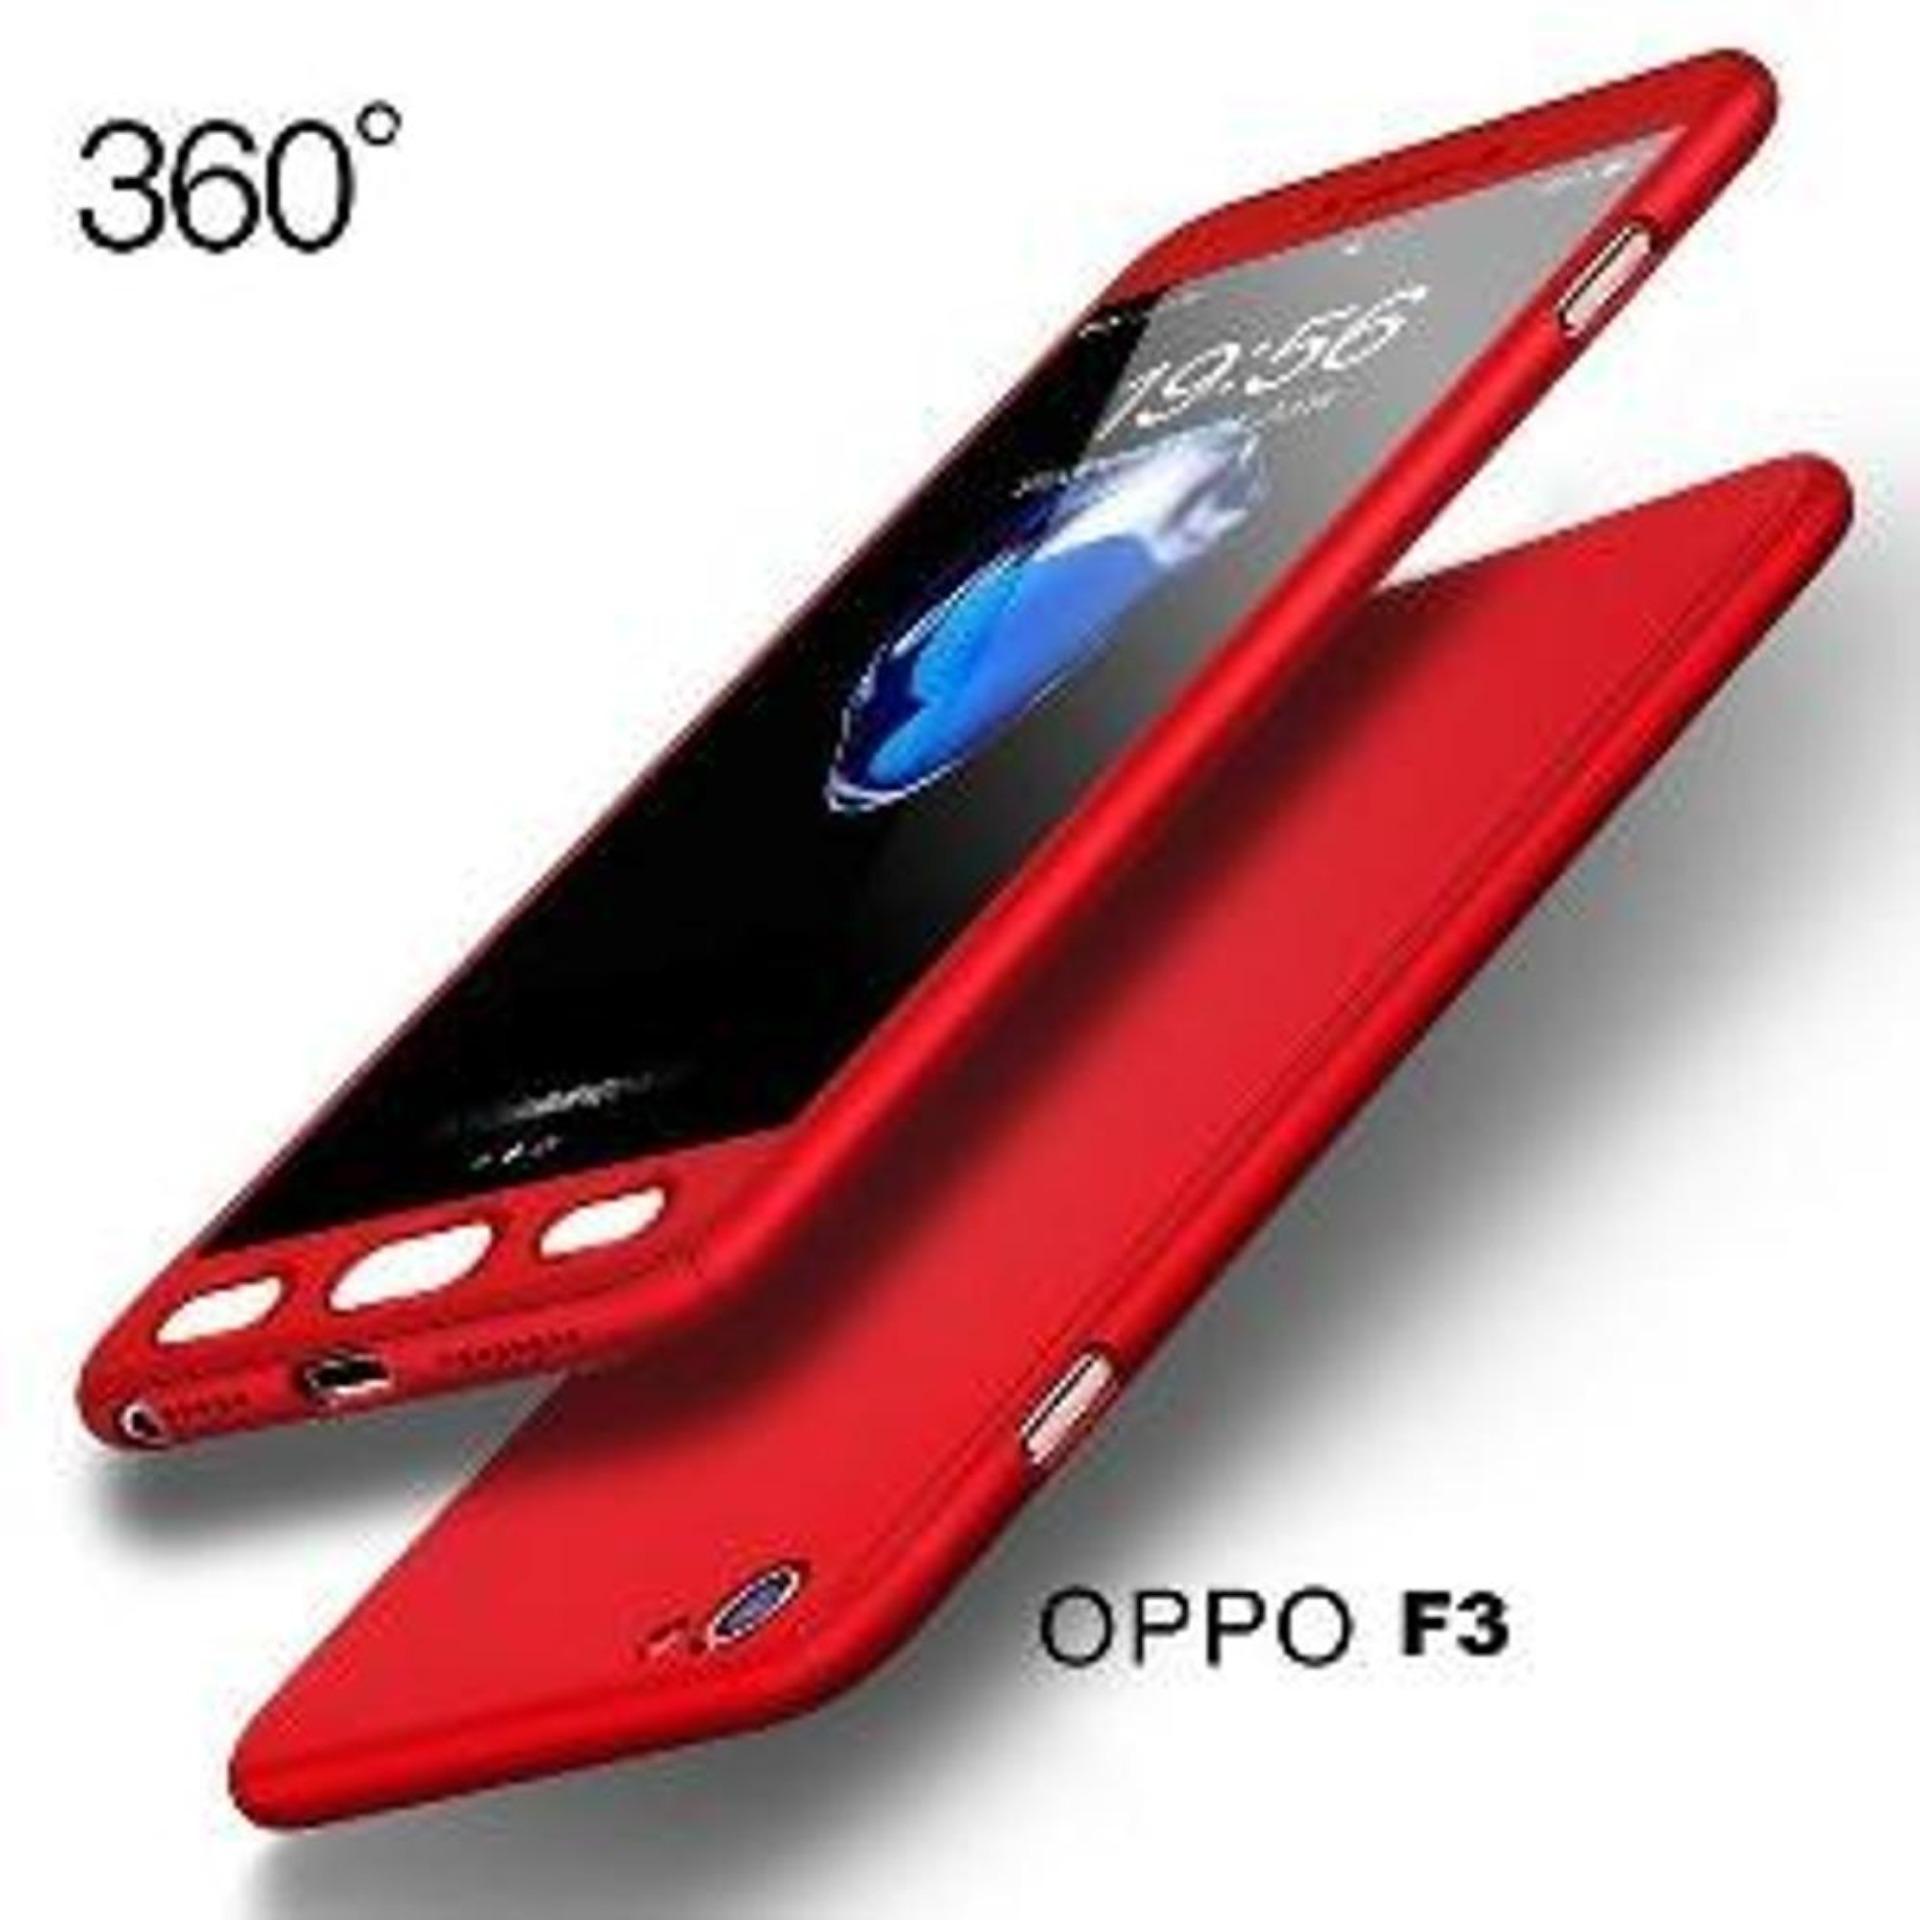 HB Tempelan Belakang HP Stand Holder Gurita Universal 24 Tentakel Perekat Handphone. Source · TRS